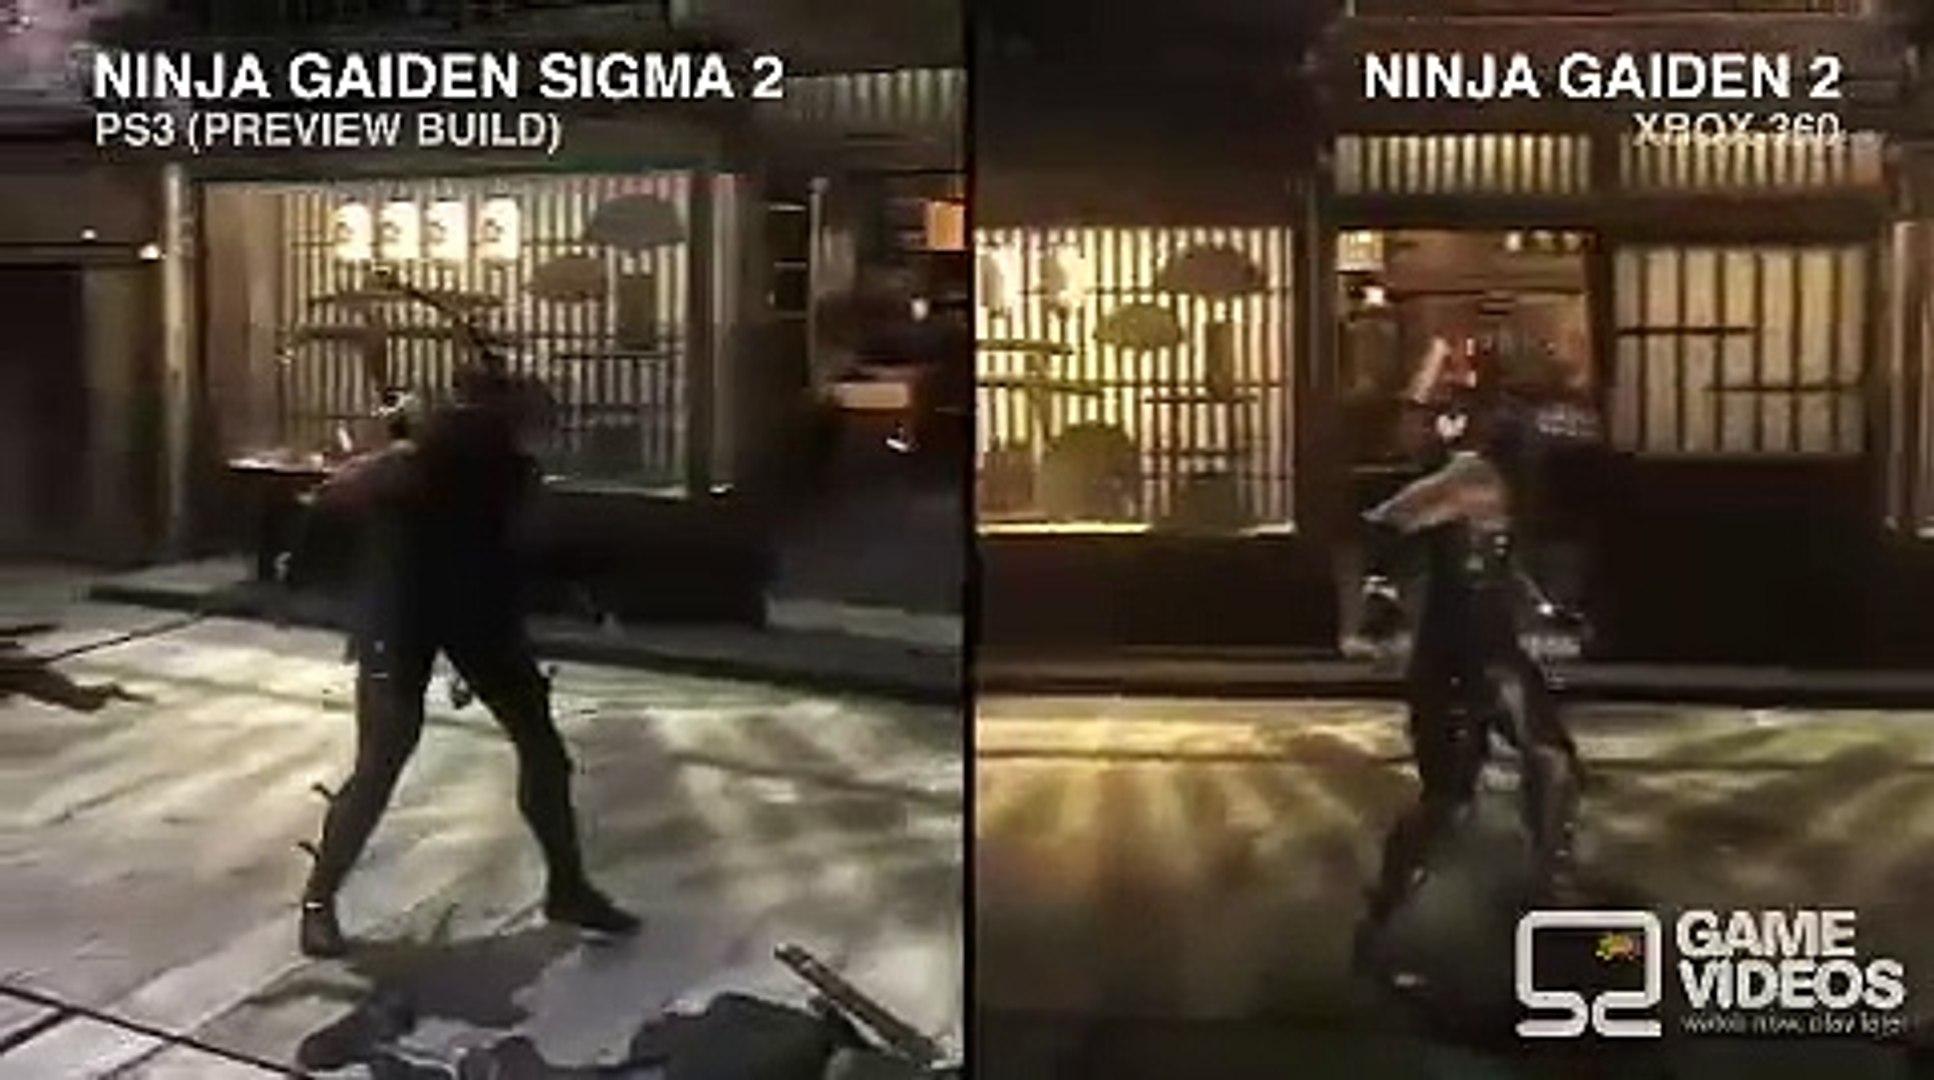 Ninja Gaiden Sigma 2 Ps3 Vs Ninja Gaiden 2 Xbox 360 Video